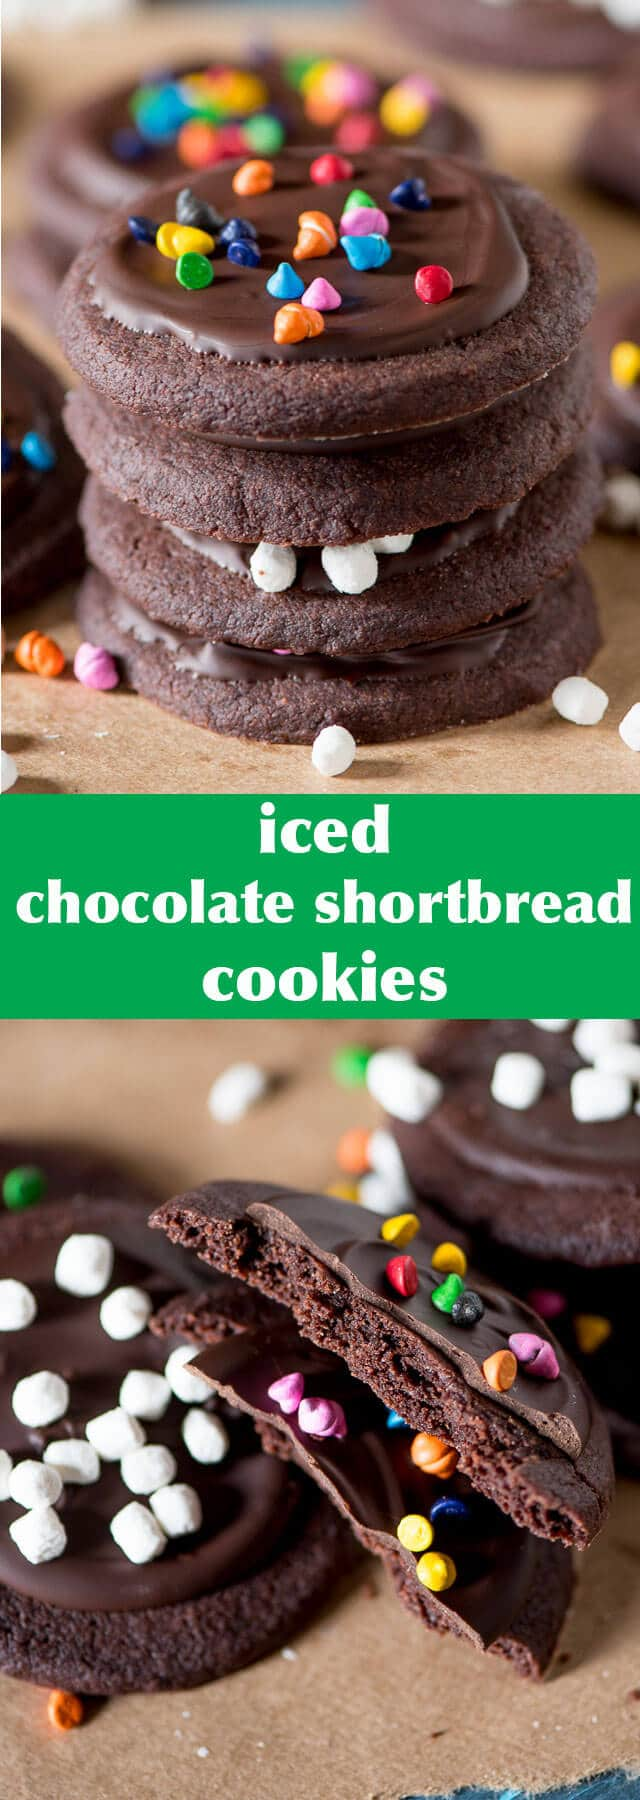 iced-chocolate-shortbread-cookies-recipe-40